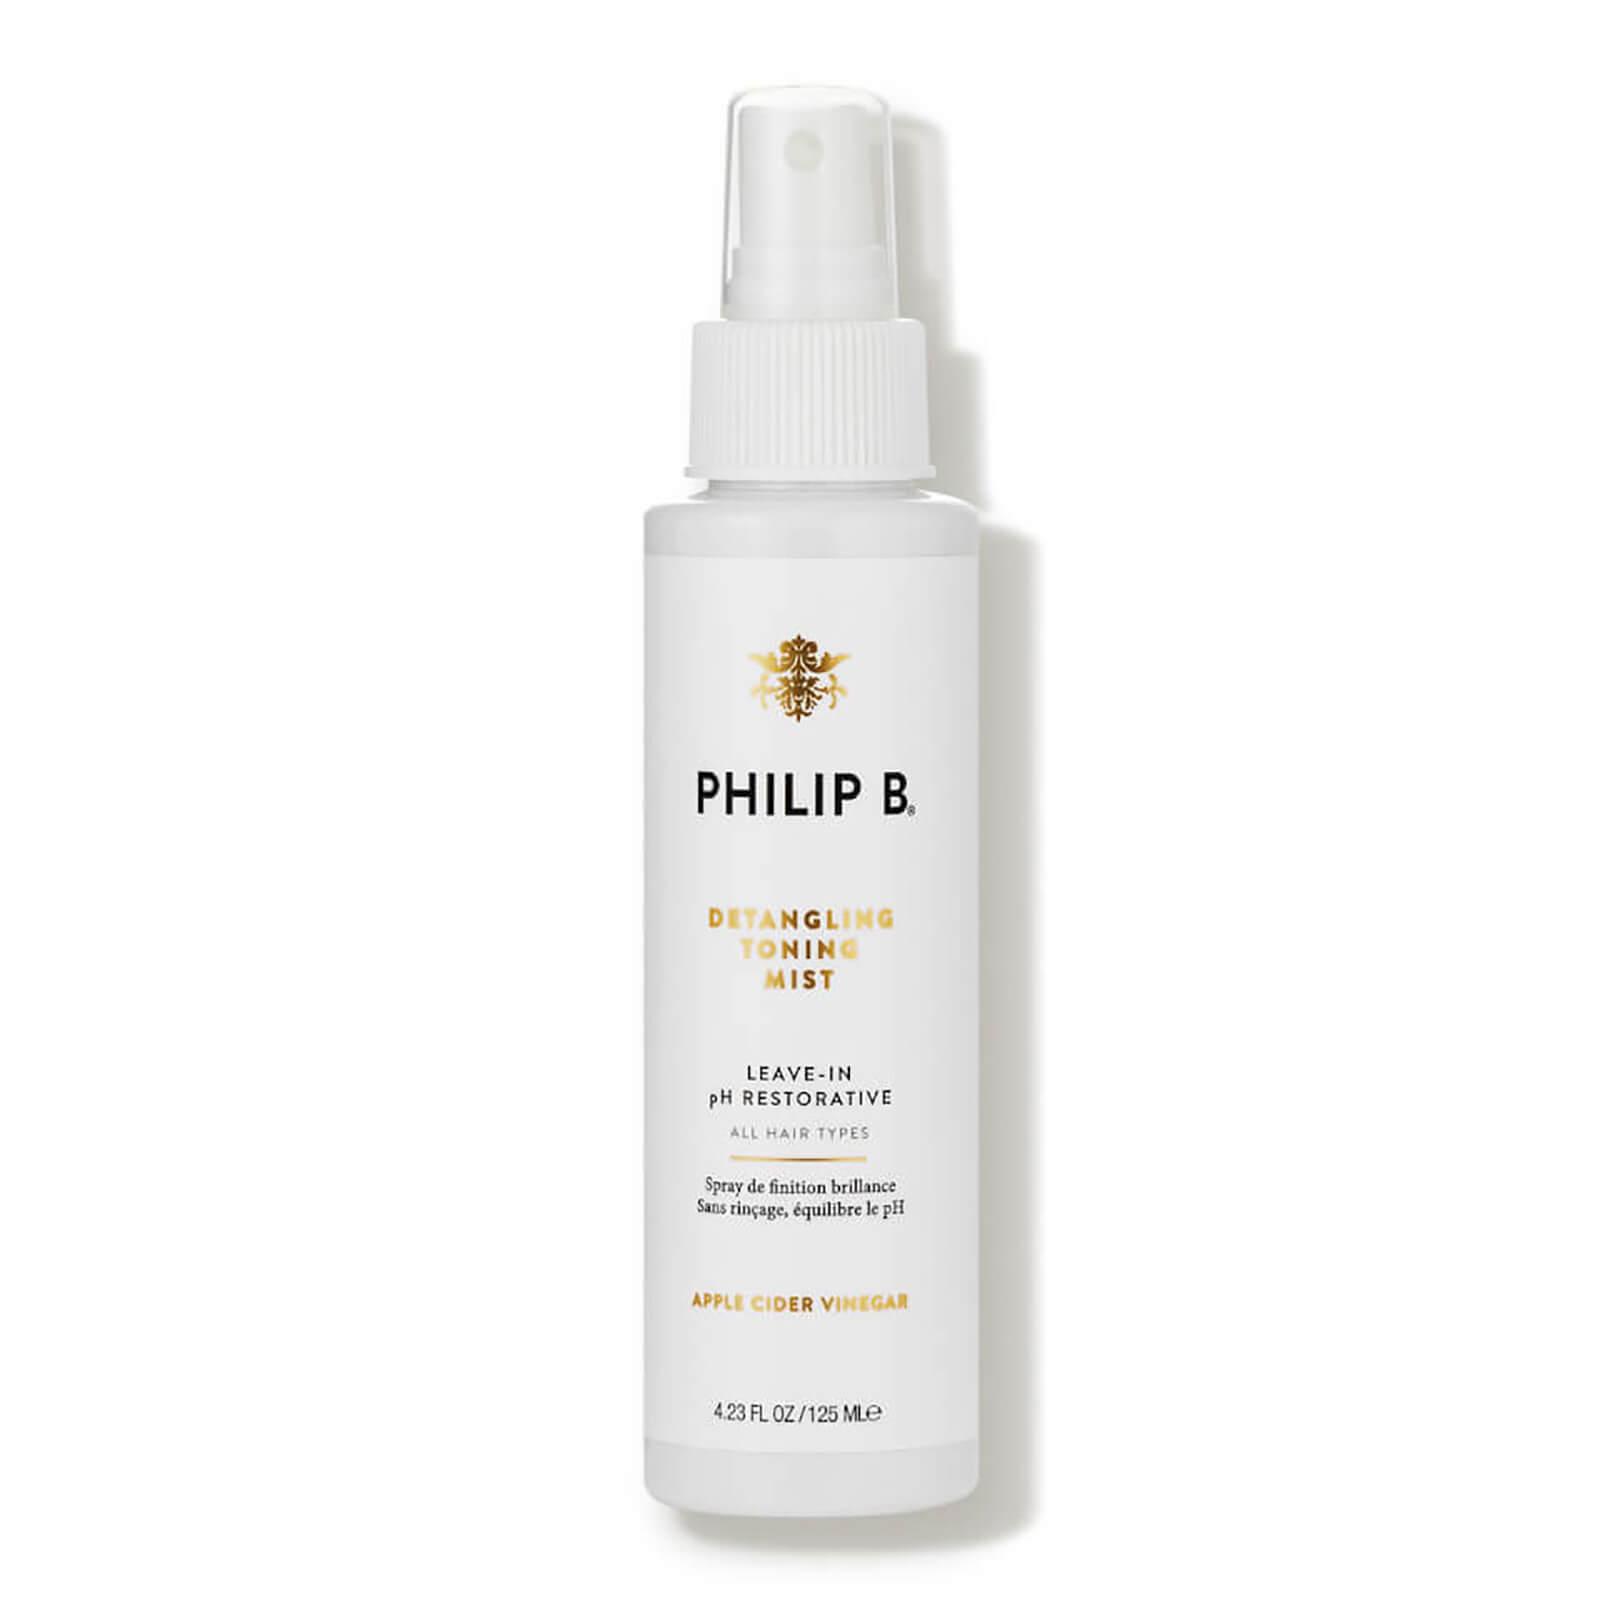 Look Fantastic coupon: Philip B pH Restorative Detangling Toning Mist 4 oz.